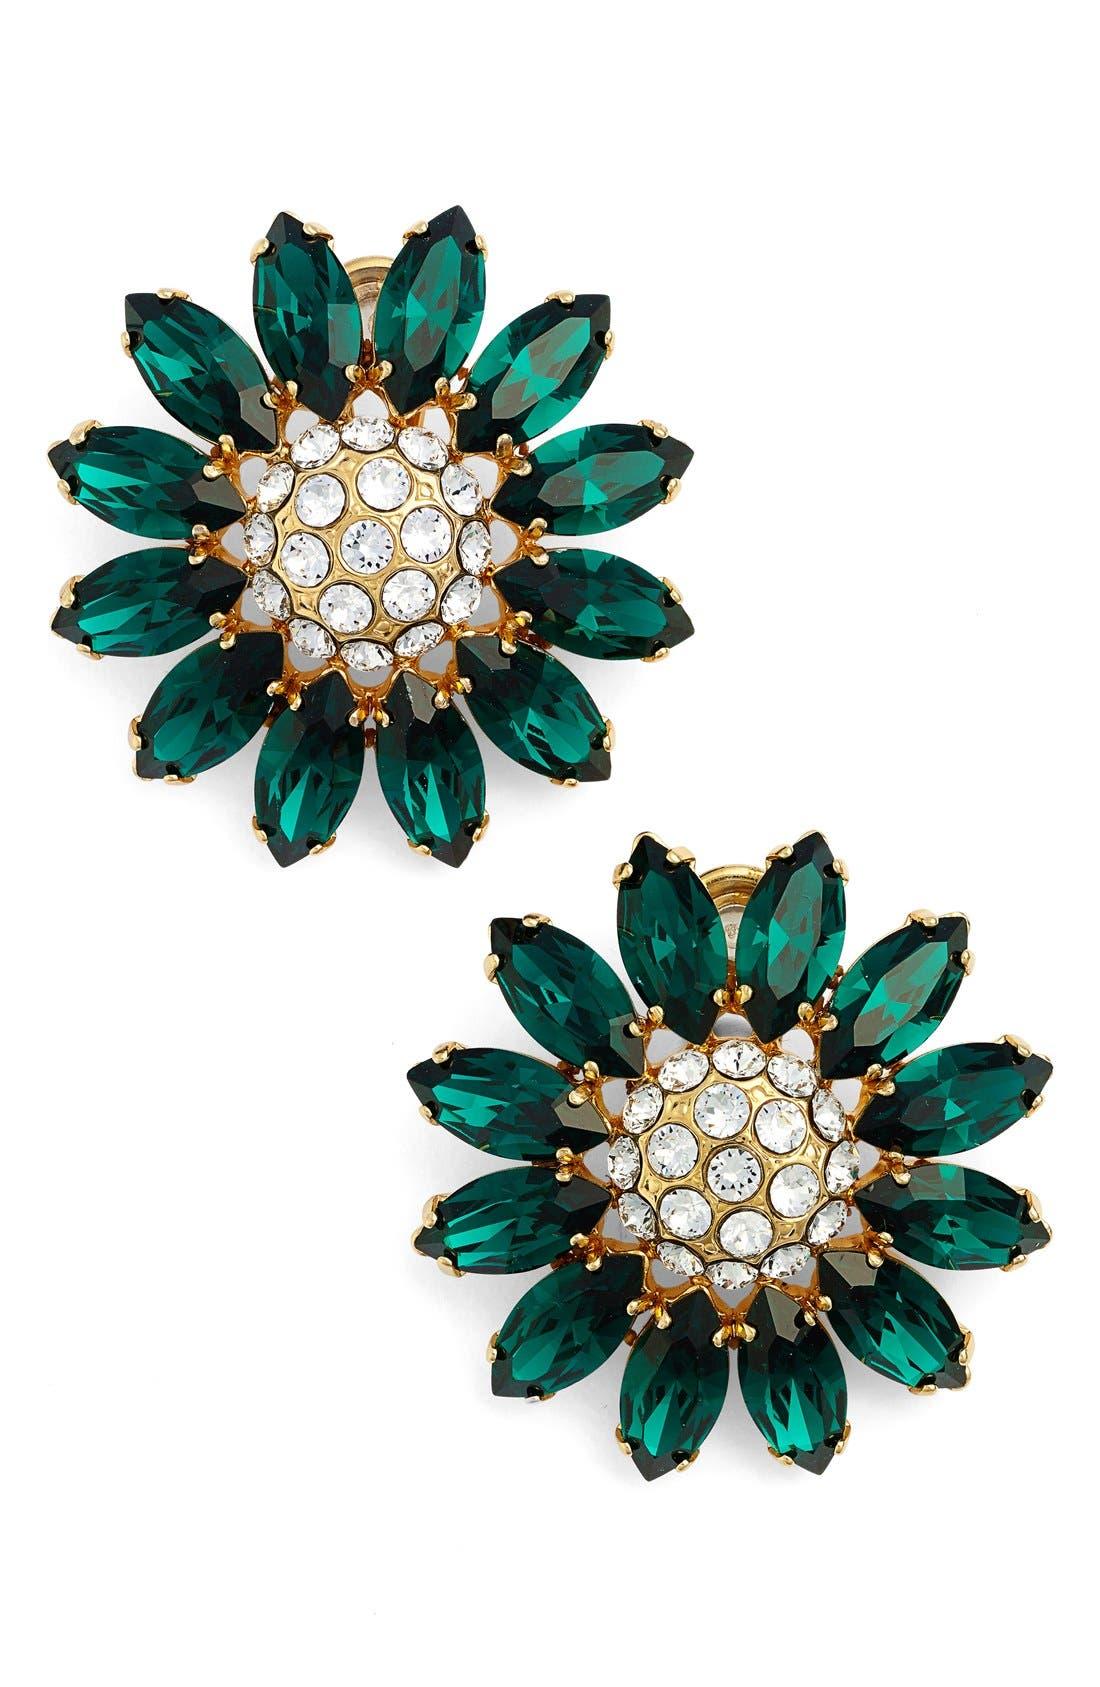 Main Image - Miu Miu 'Rebels' Crystal Floral Stud Earrings